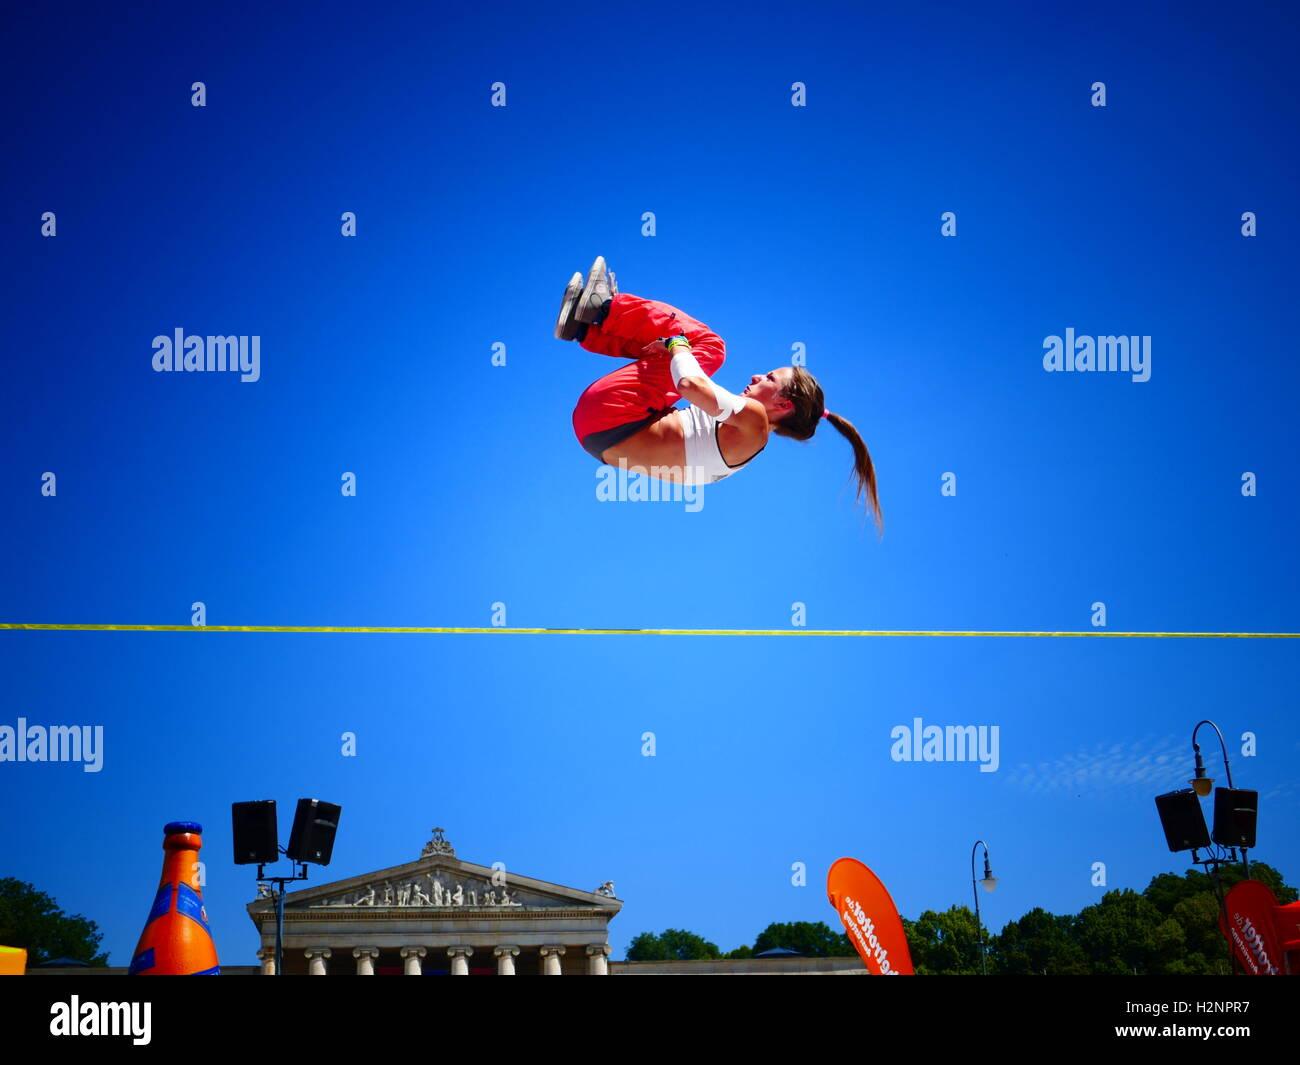 La concurrence dans le sport Slackliner Slackline festival Munich Allemagne Europe Banque D'Images